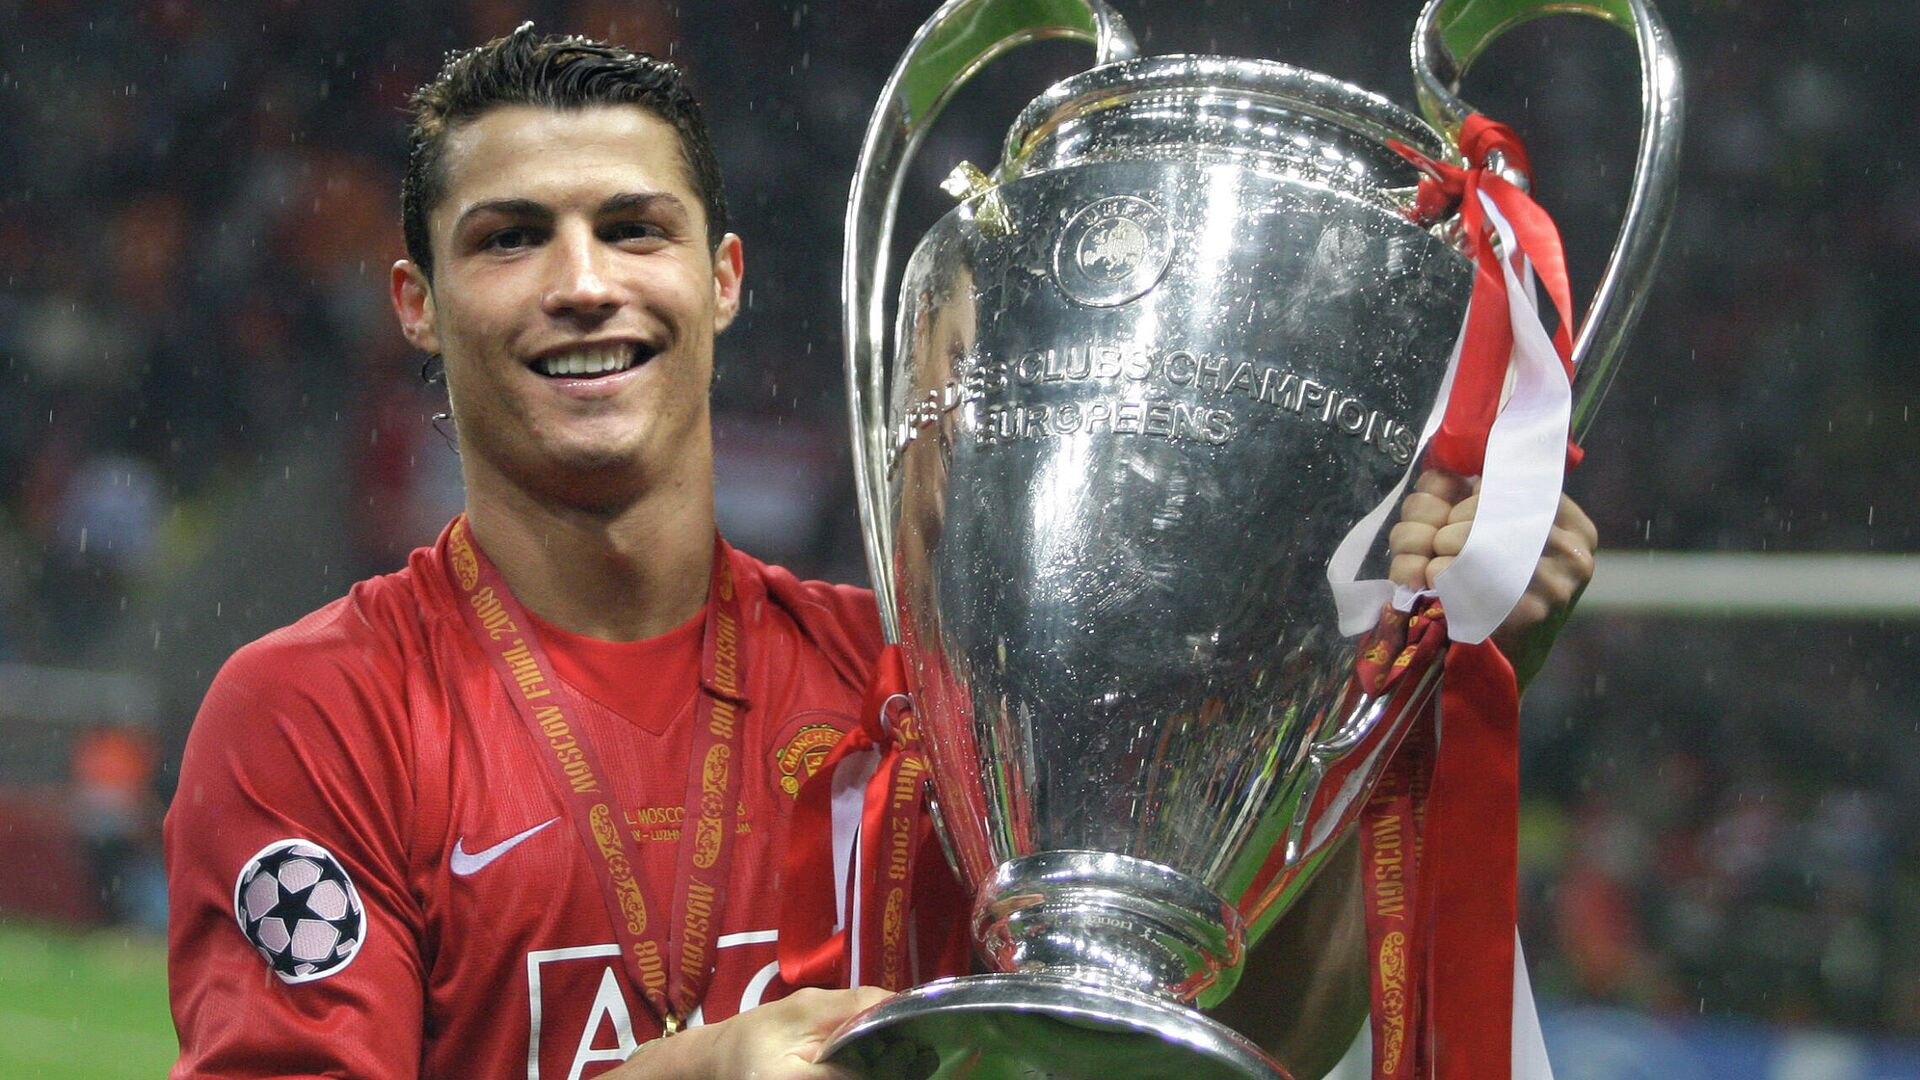 Cristiano Ronaldo mit dem Champions-League-Pokal, Moskau, 2008 - SNA, 1920, 13.09.2021